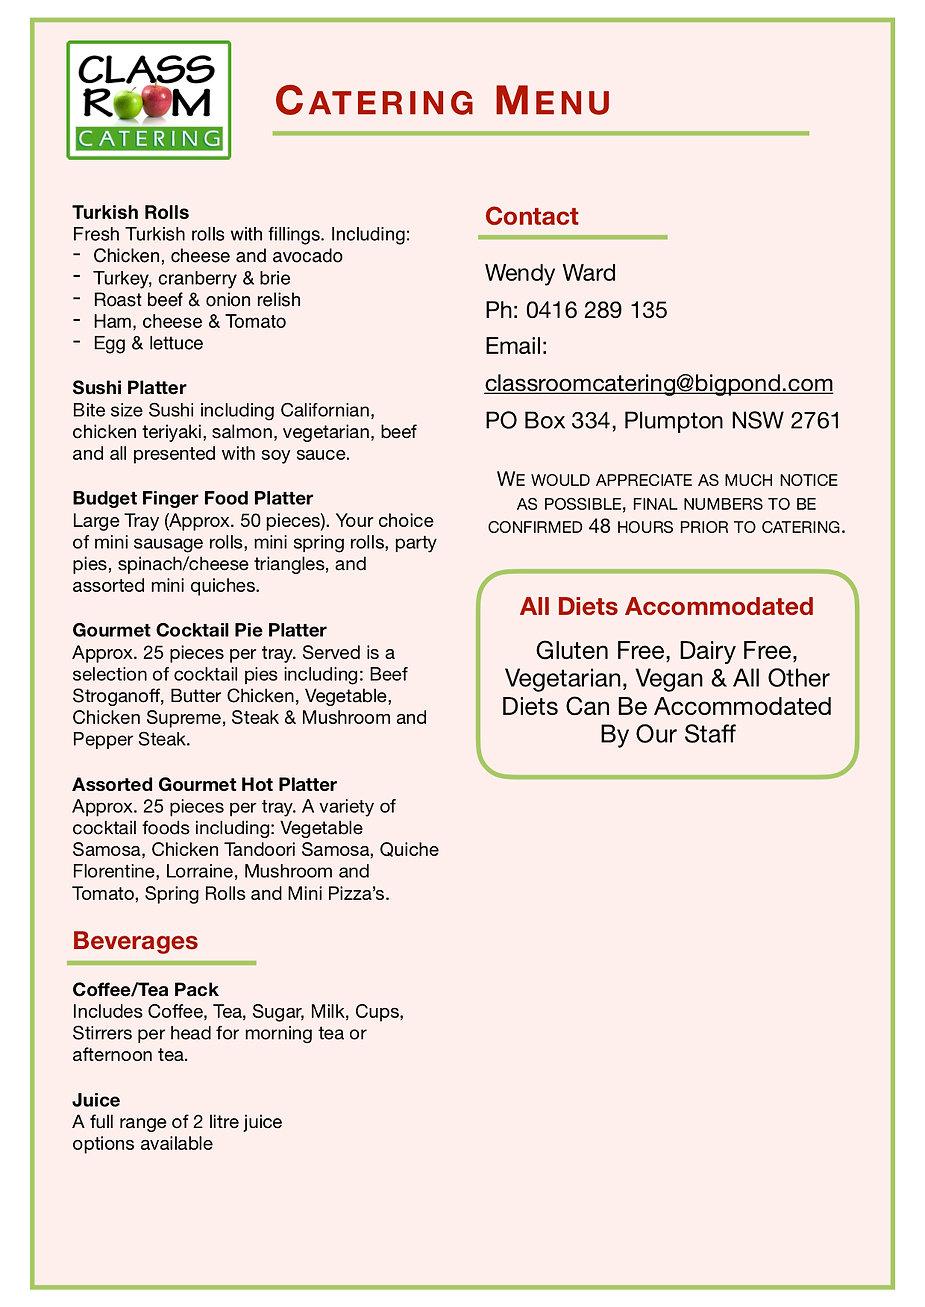 CC Catering Menu 2020 Red BG copy 2 of 2